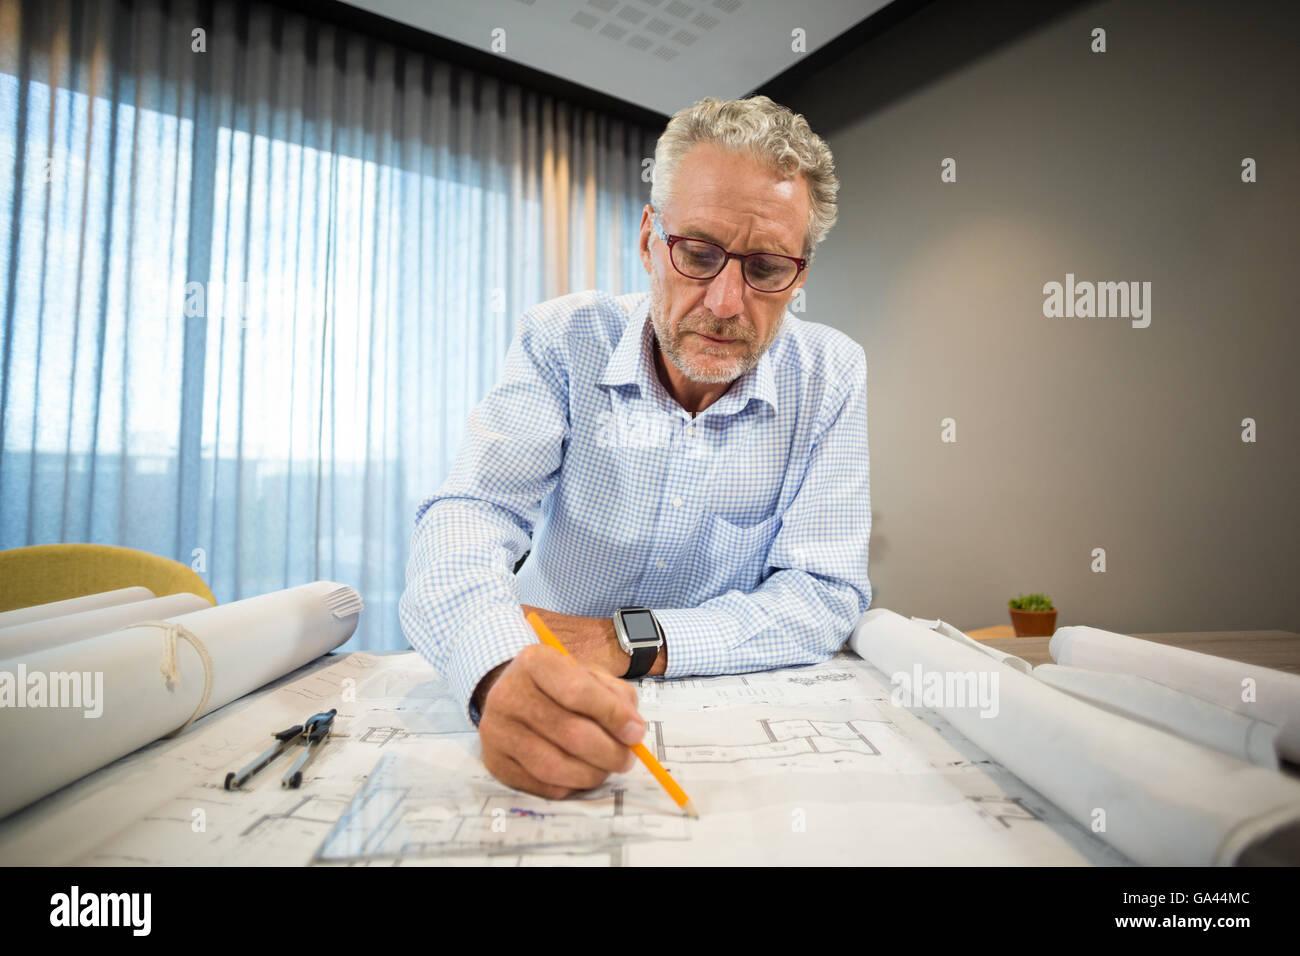 Architect working on blueprint at desk - Stock Image